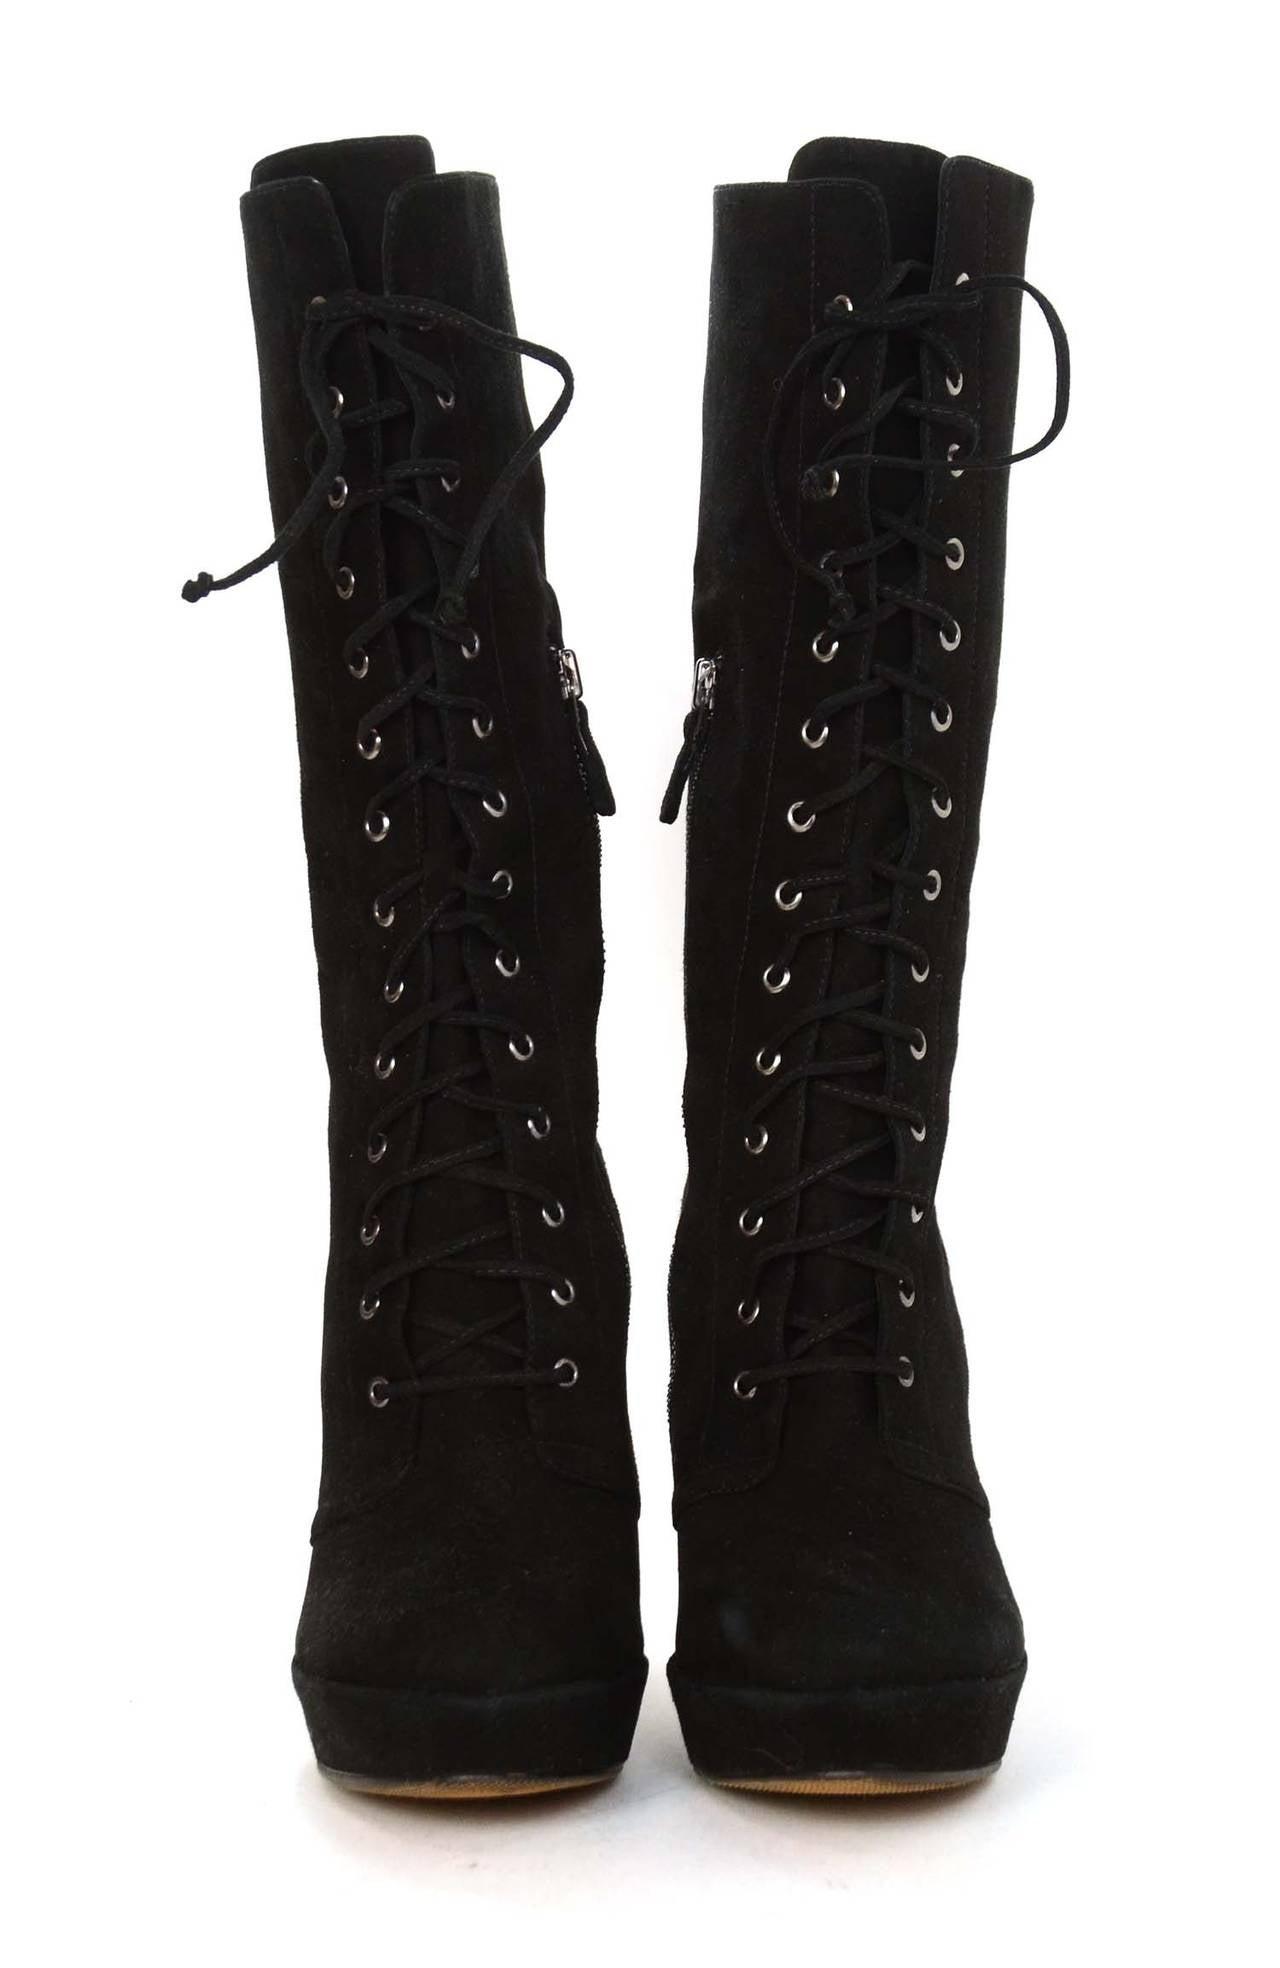 ALEXANDRE BIRMAN Black Suede Lace Up Heeled Boots sz. 10.5 2